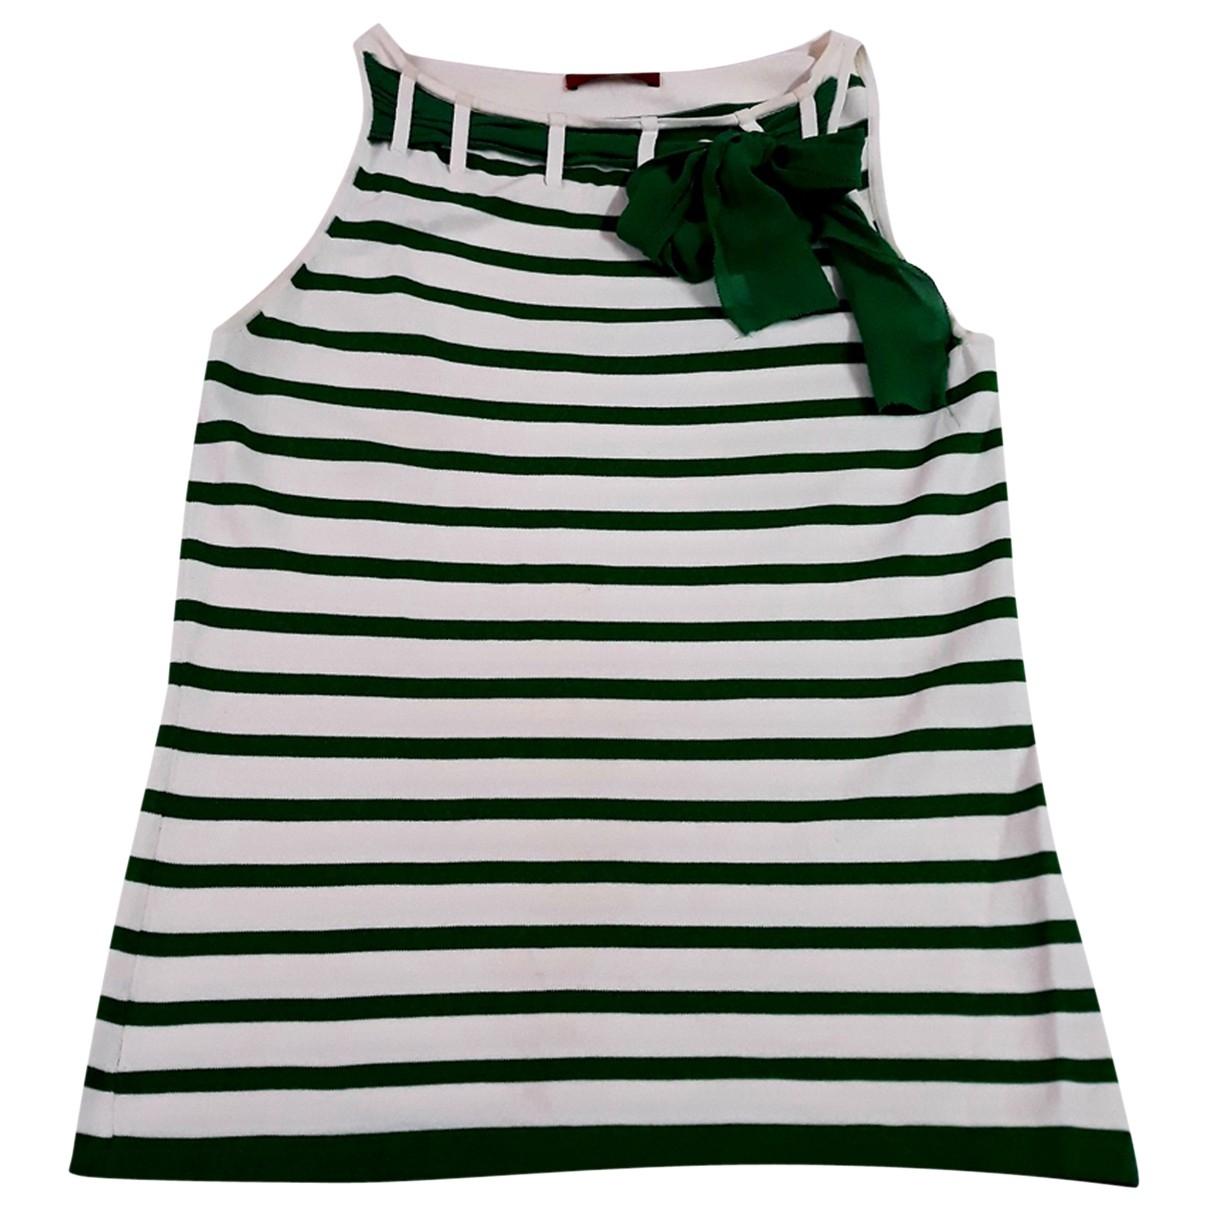 Carolina Herrera \N Top in  Gruen Polyester